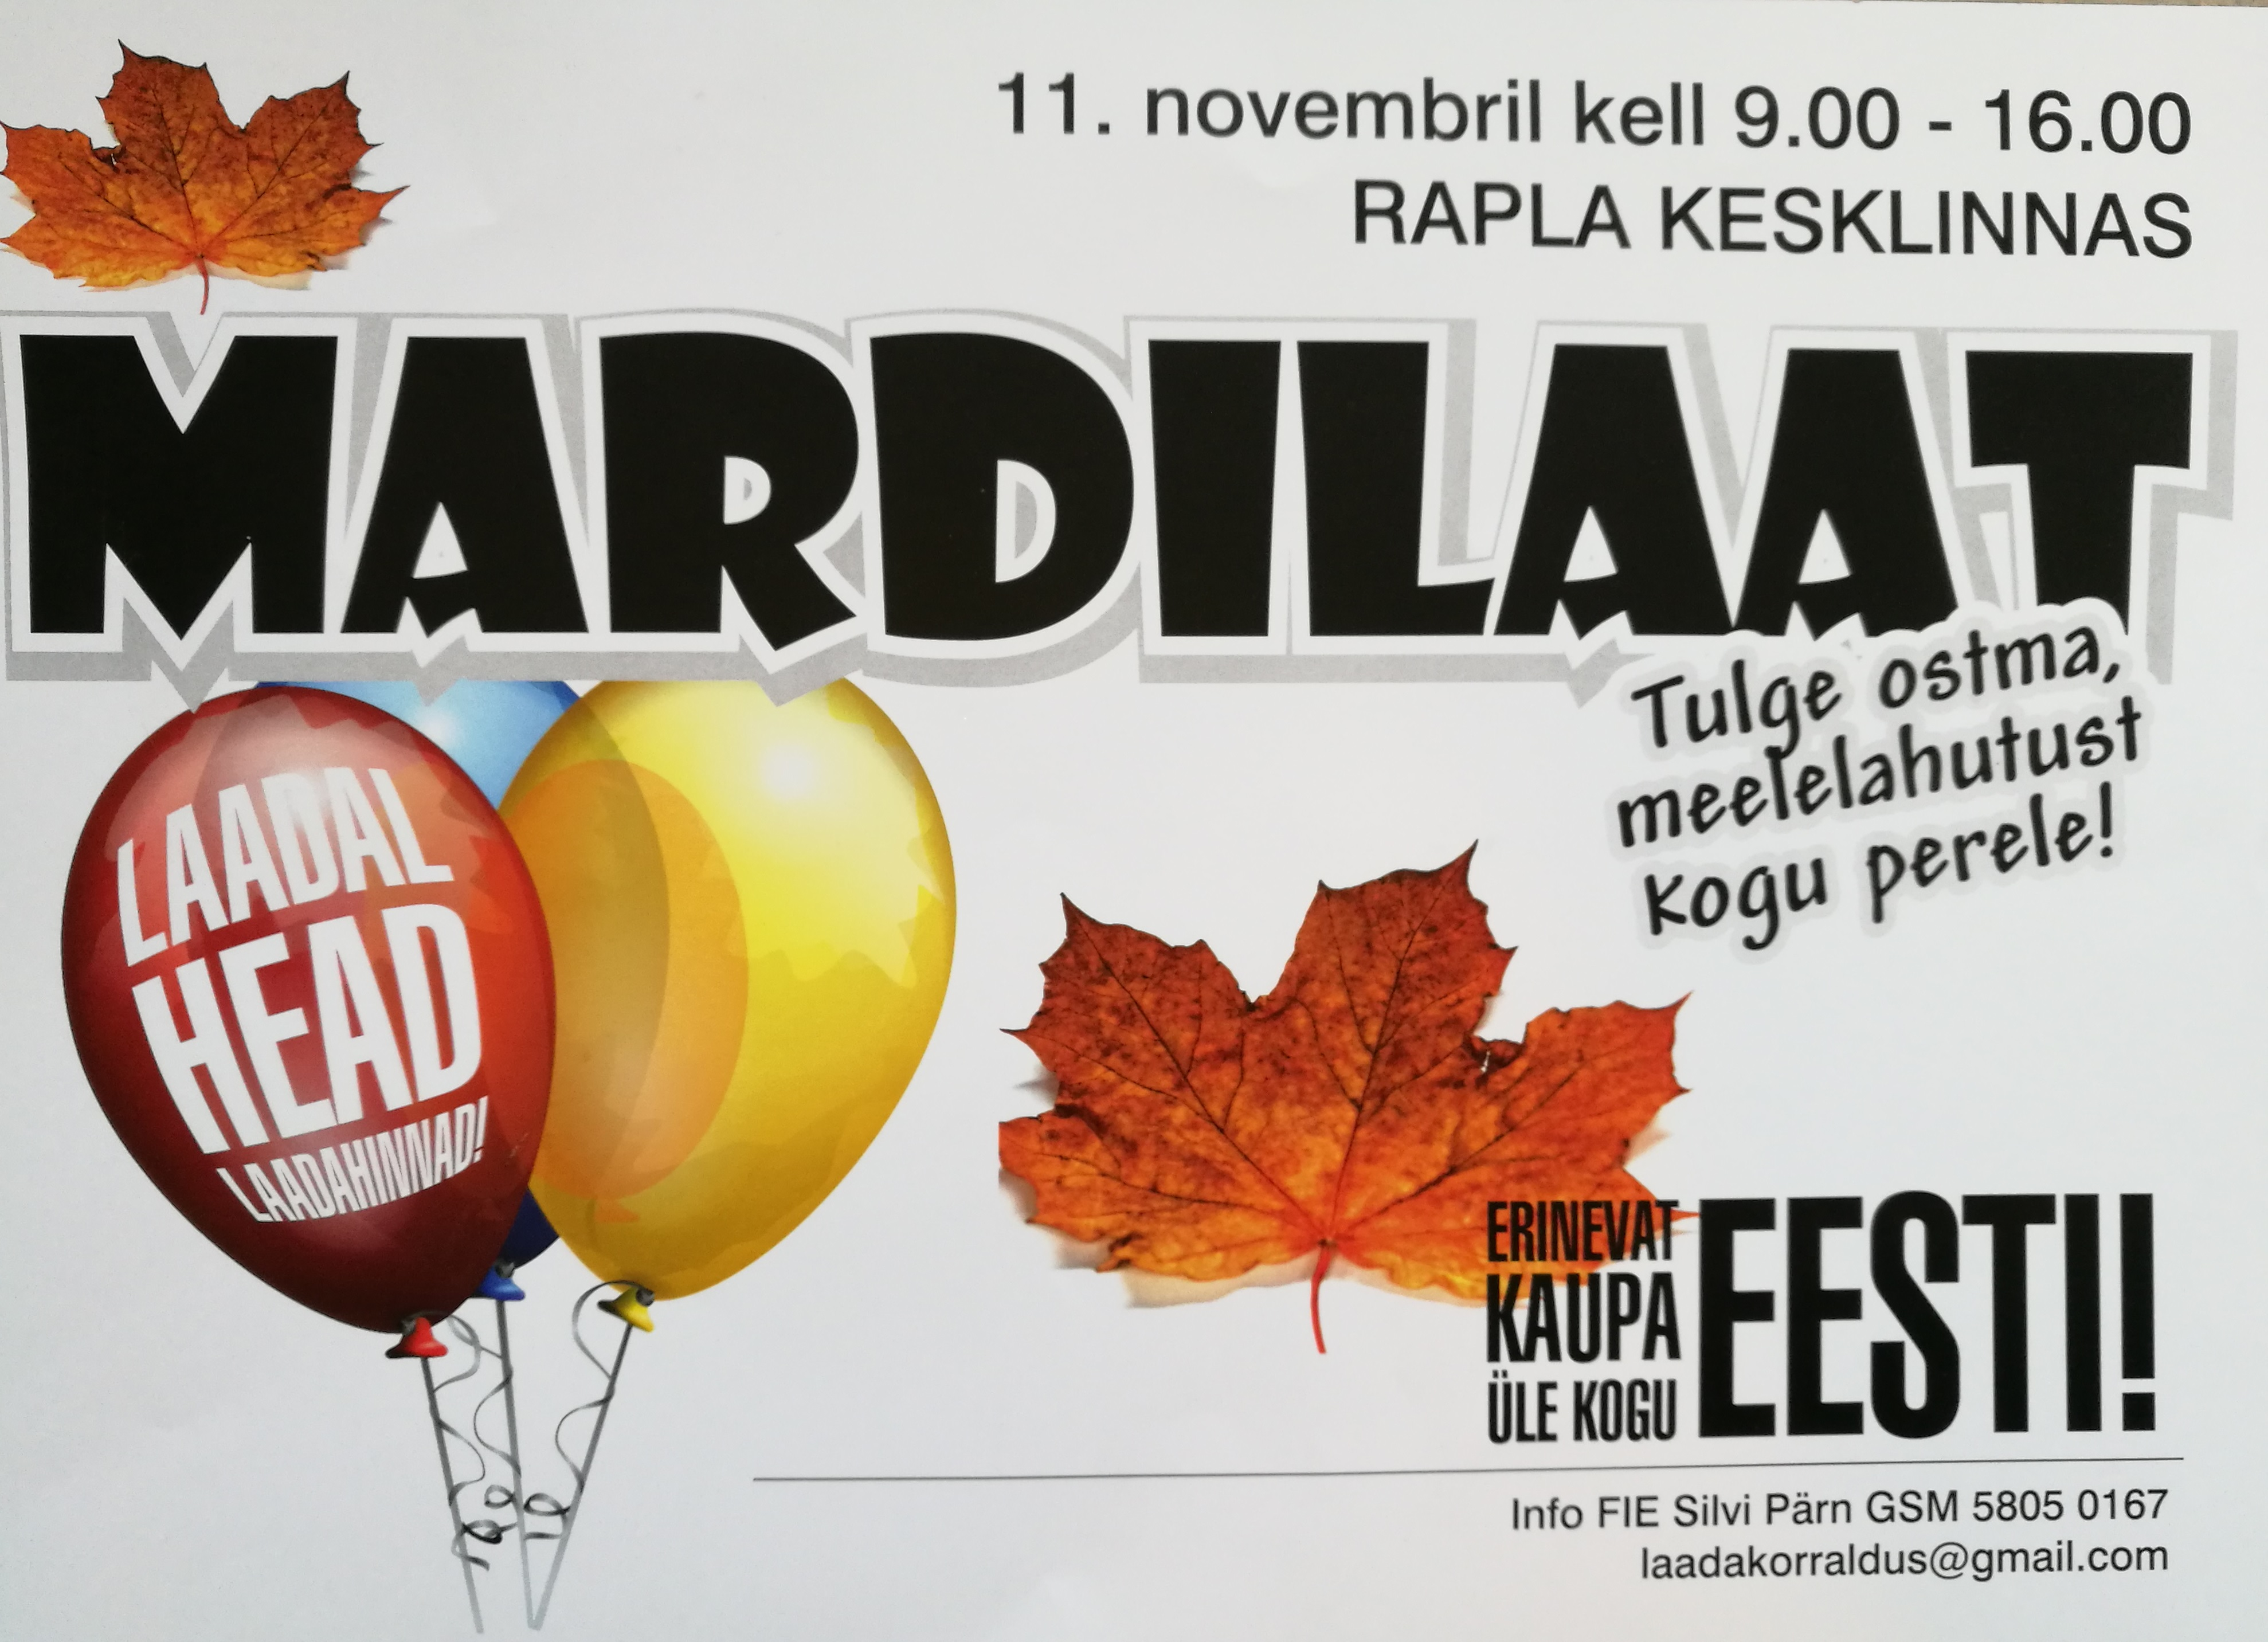 Mardilaat